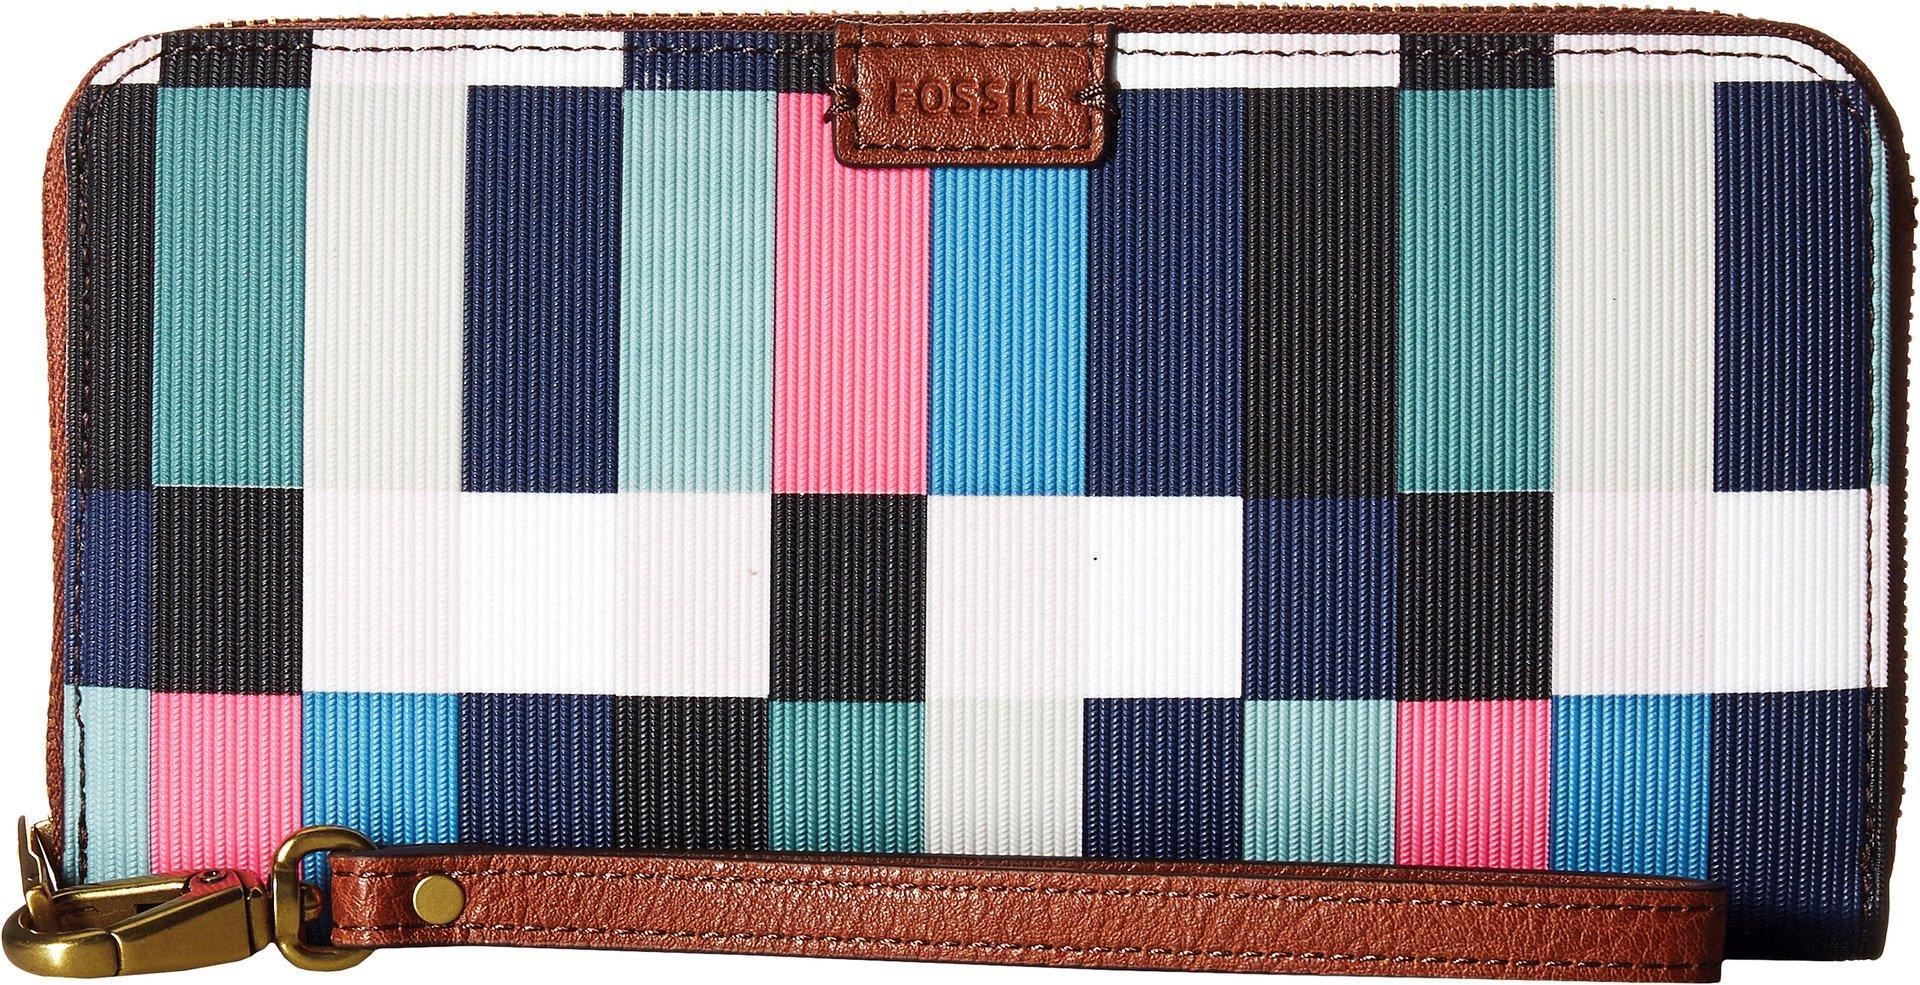 Fossil Emma Rfid Large Zip Wallet, Bright Multi